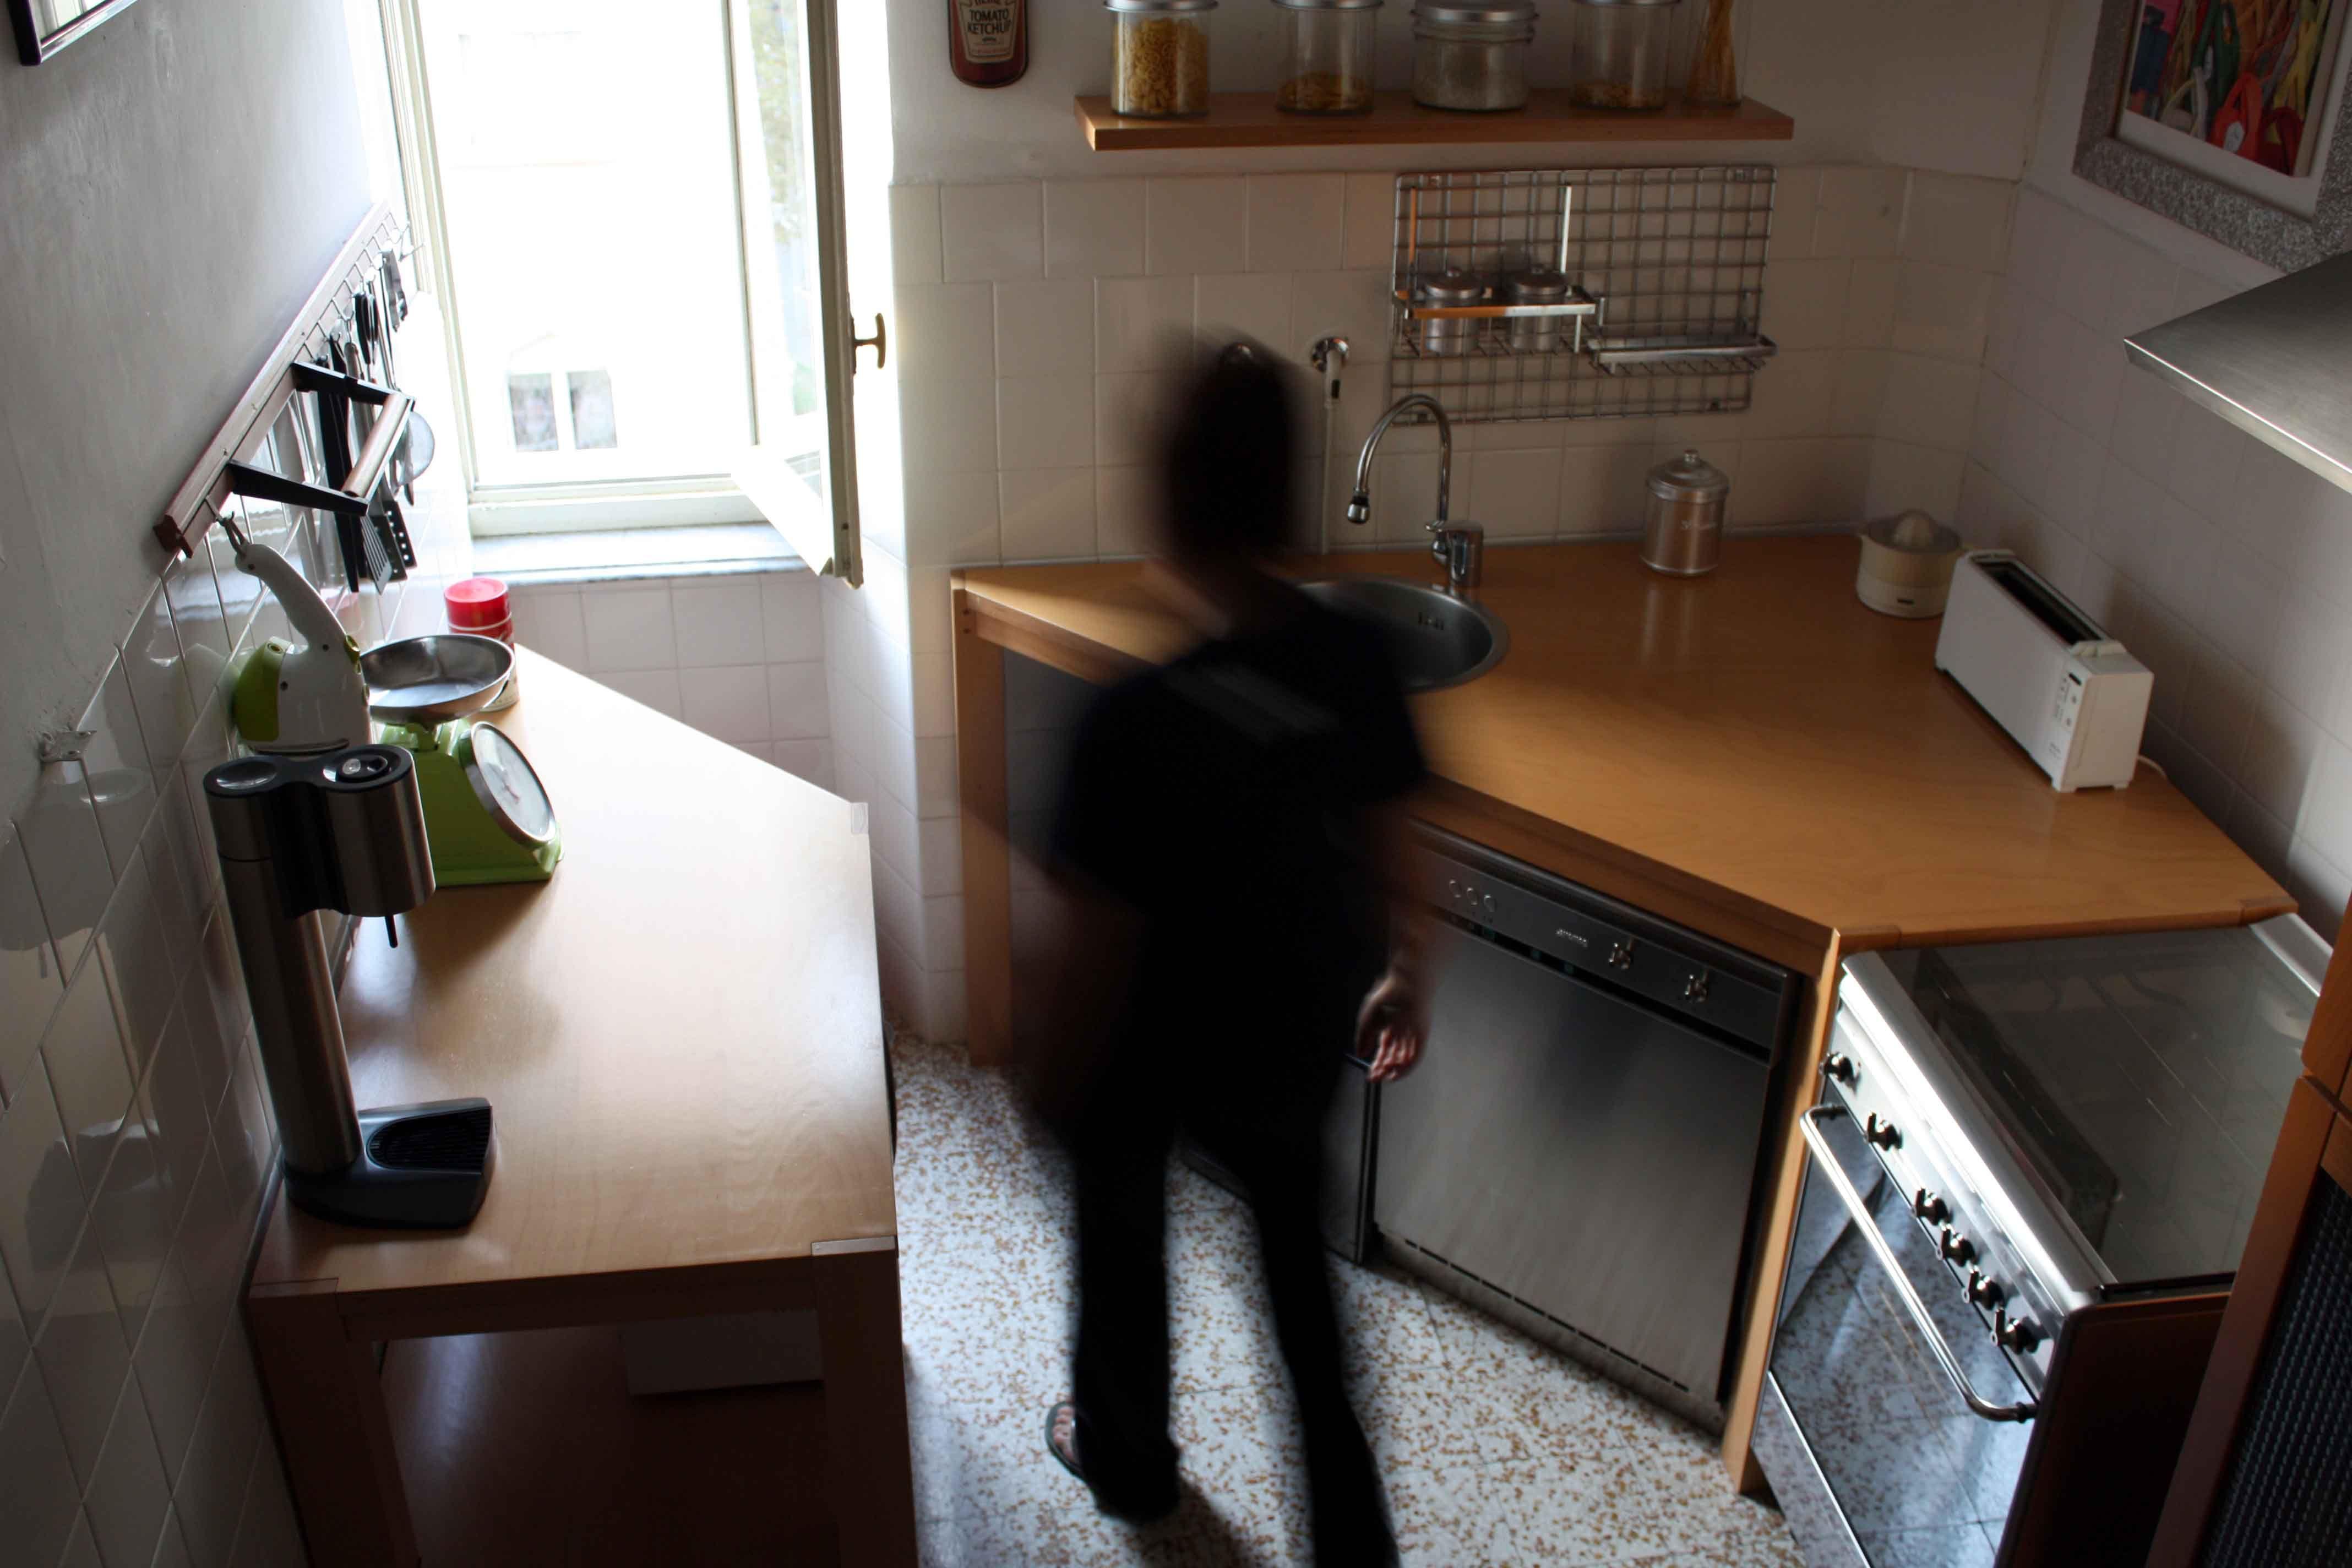 Arredamento per una cucina